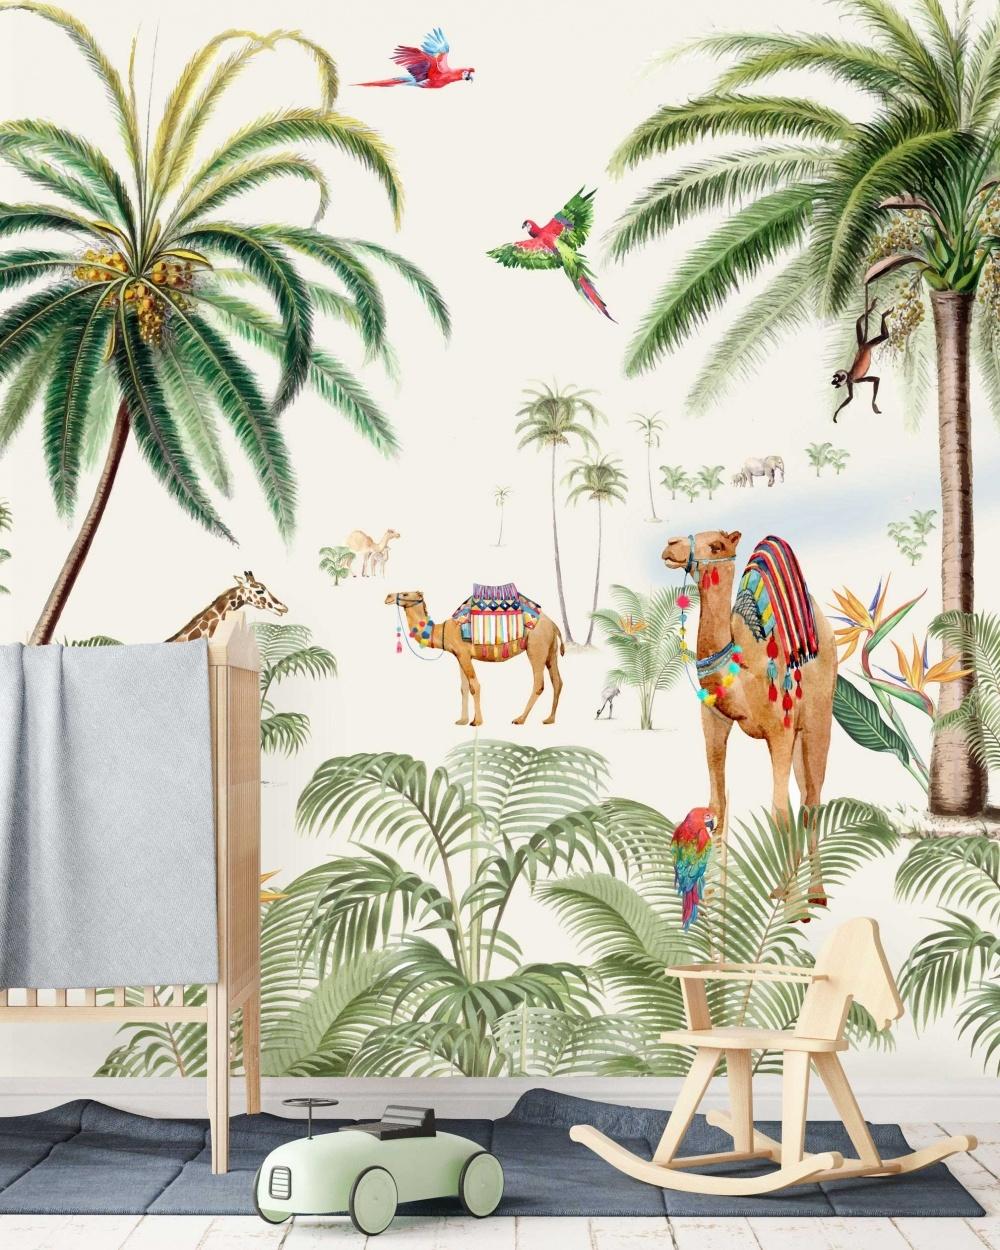 Creative Lab Amsterdam  Wall Paper Binti Baby - 203x303cm - Prize per m2: € 27,00